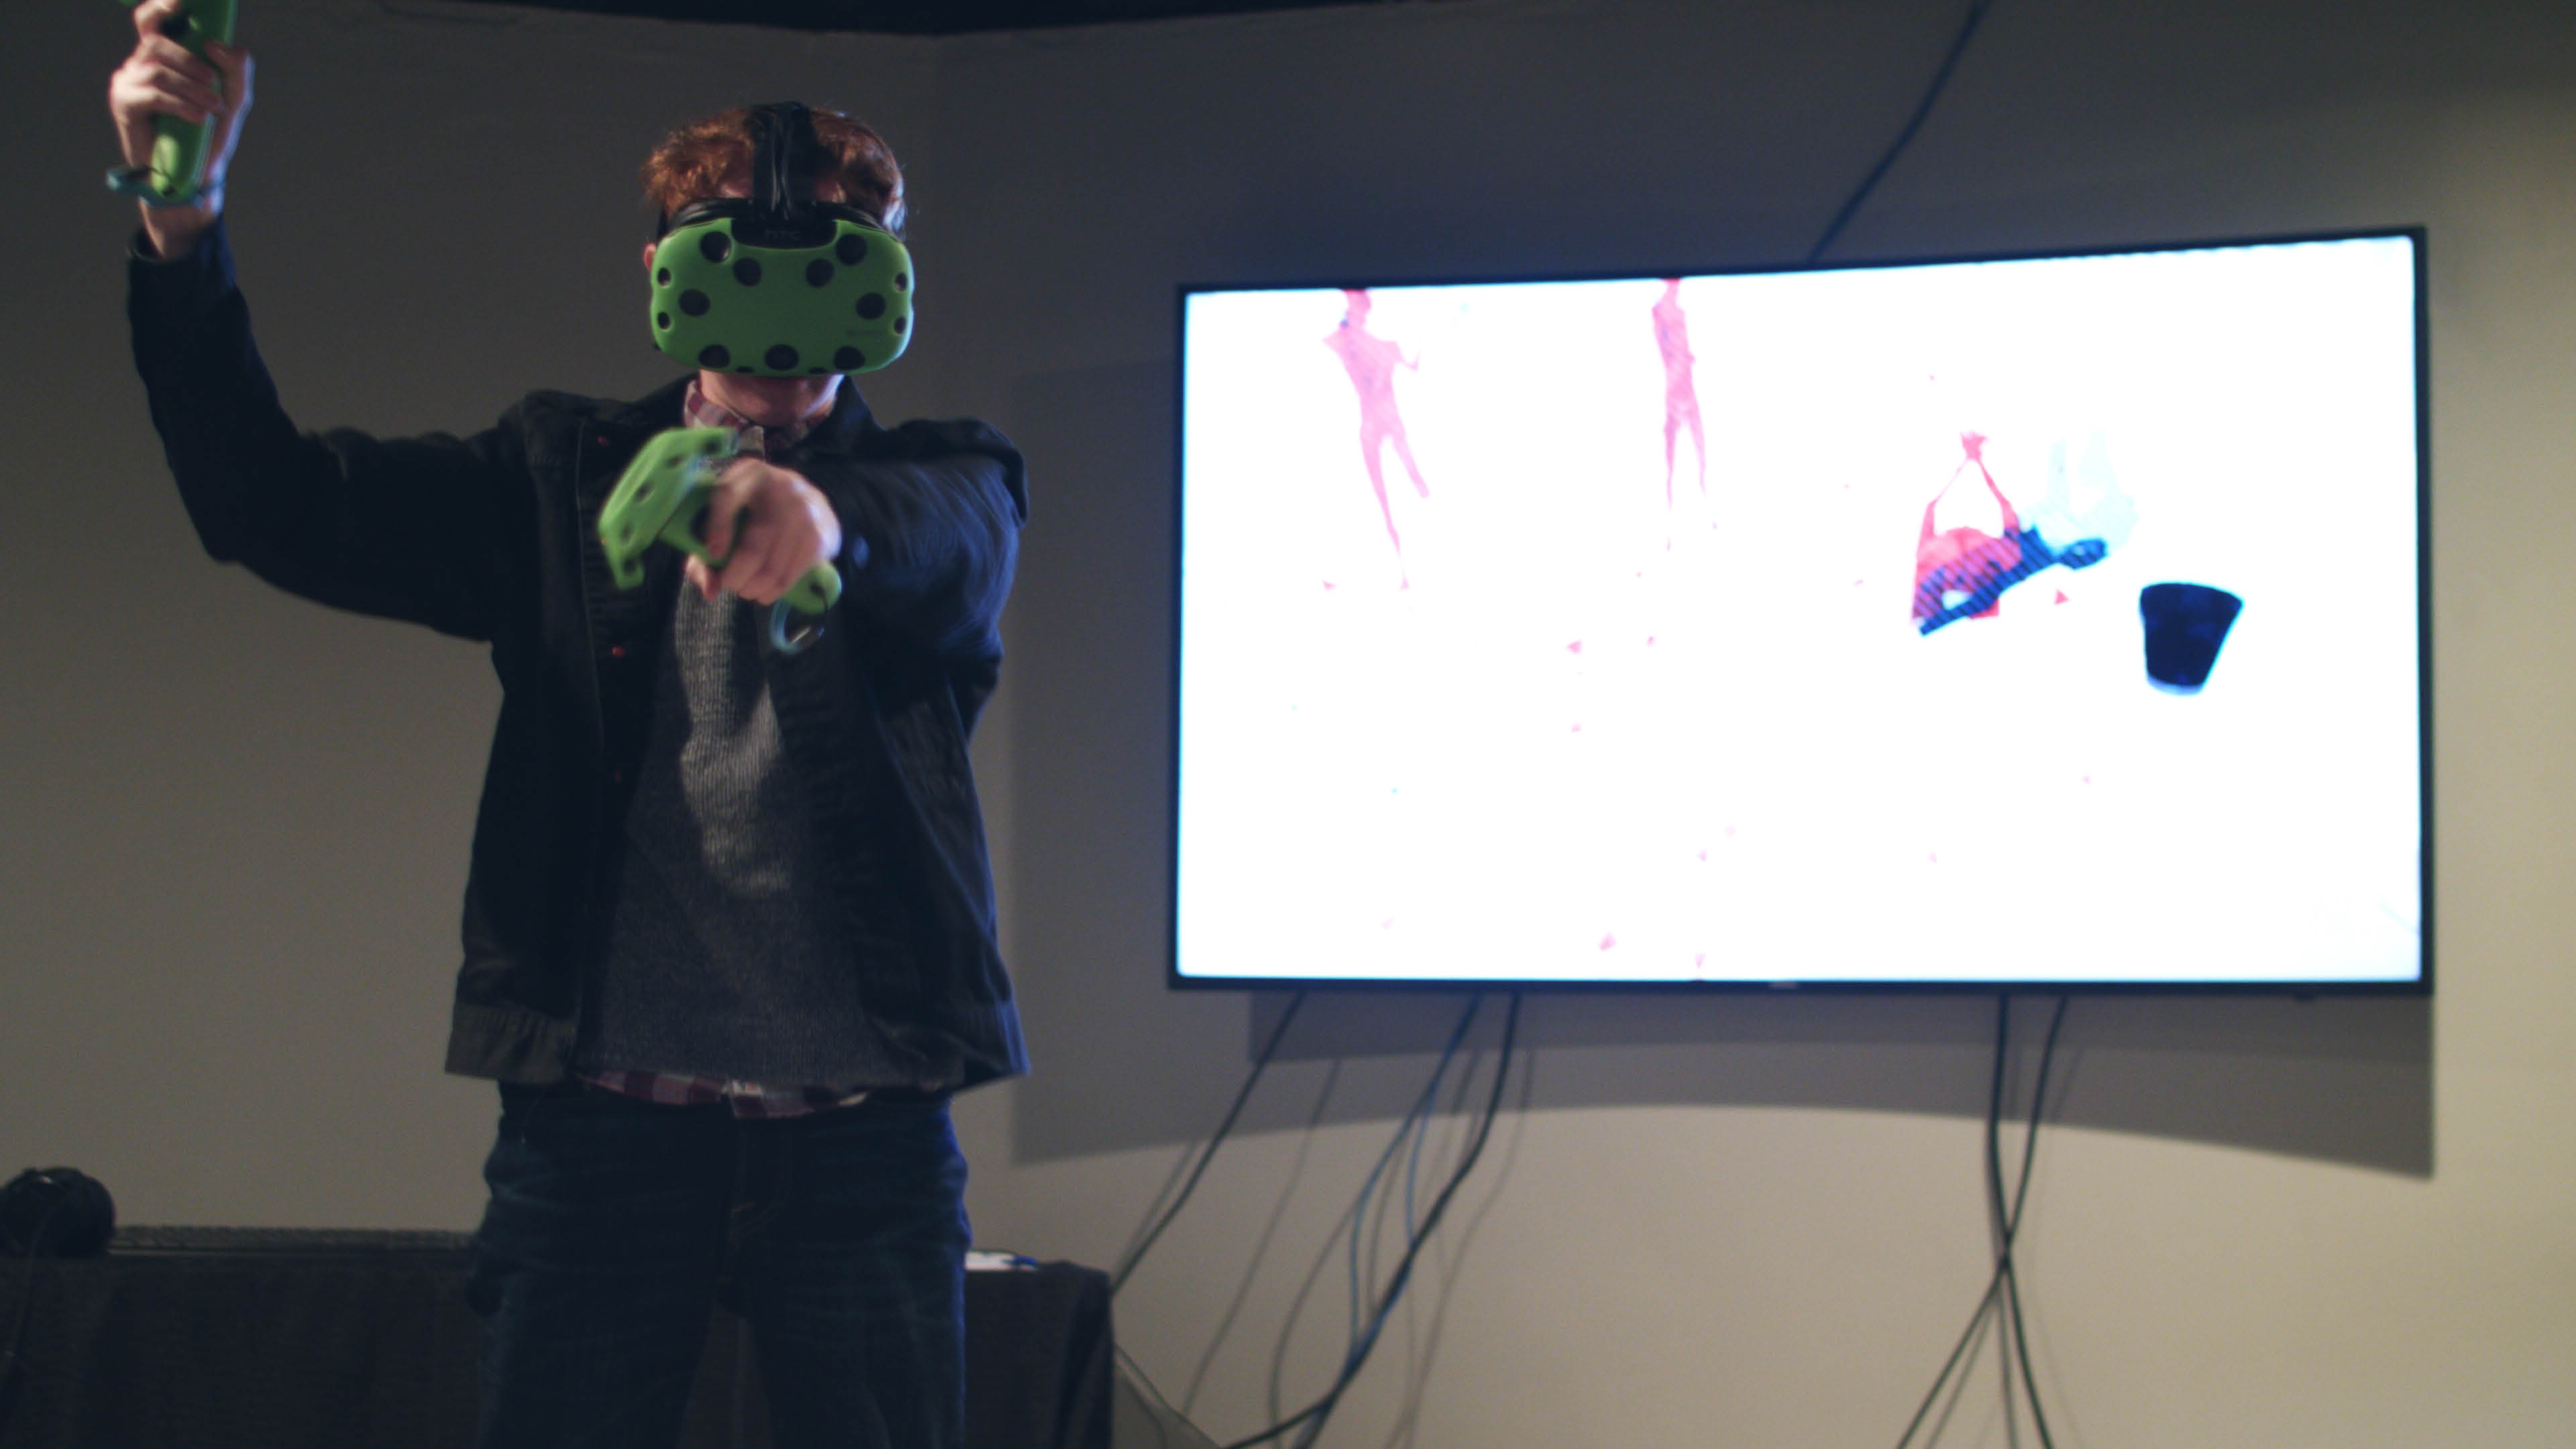 Virtual Reality Gaming in North Salt Lake, Davis County, Utah